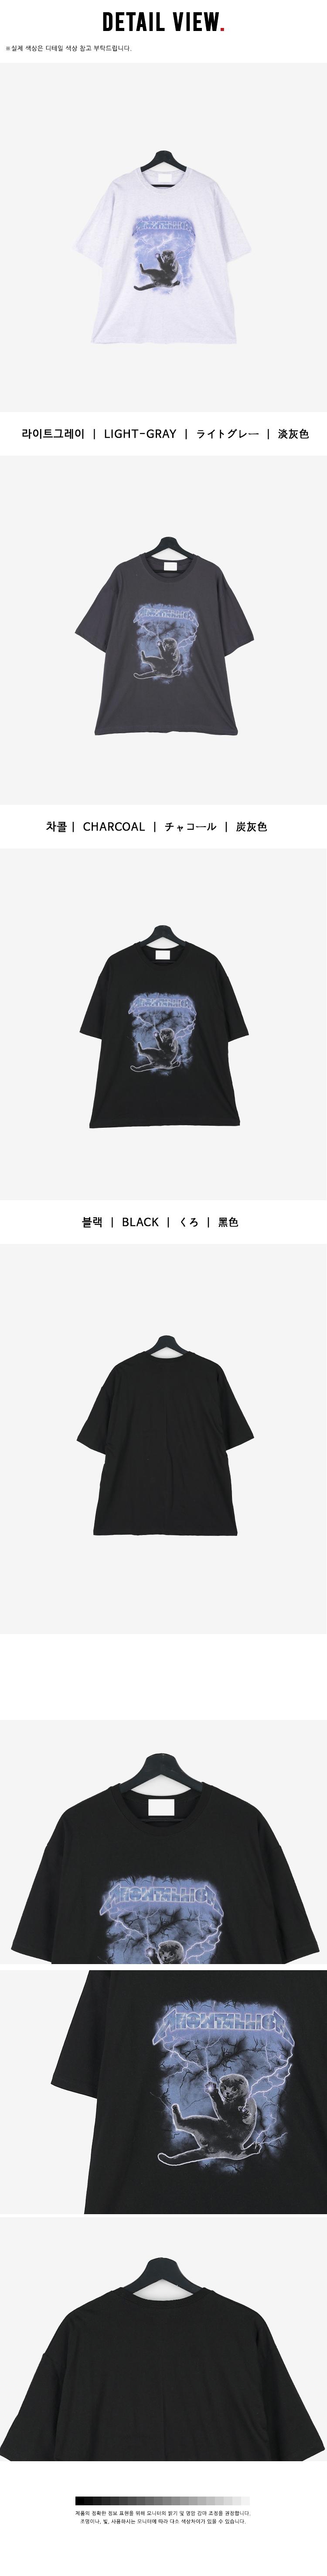 Lilkar Cat Short Sleeve T-shirt